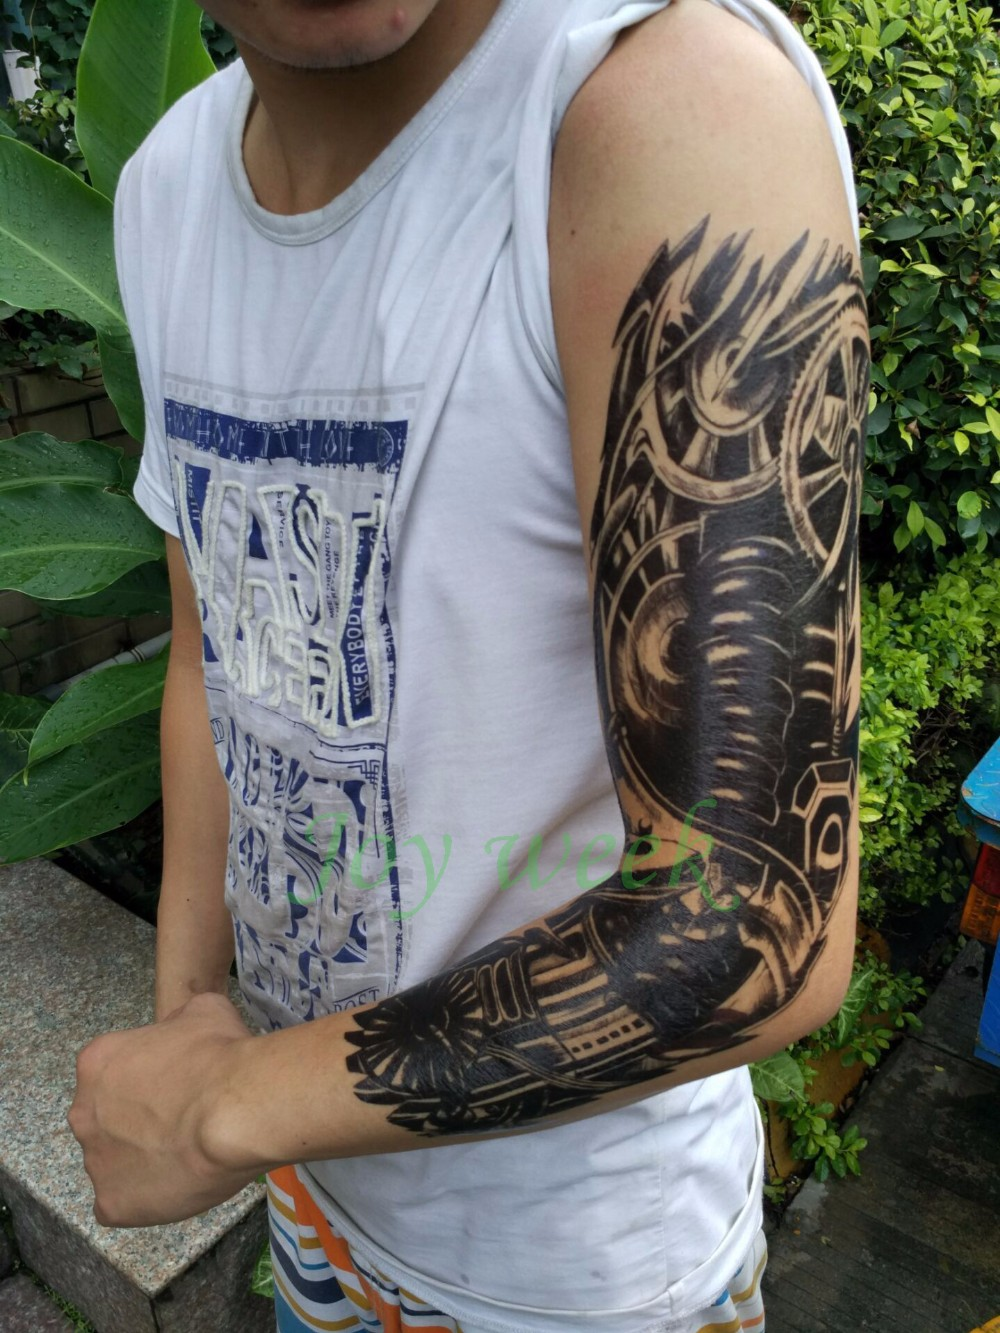 Waterproof Temporary Tattoo Sticker full arm large size robot arm tatto flash tatoo fake tattoos sleeve for men women 19 1